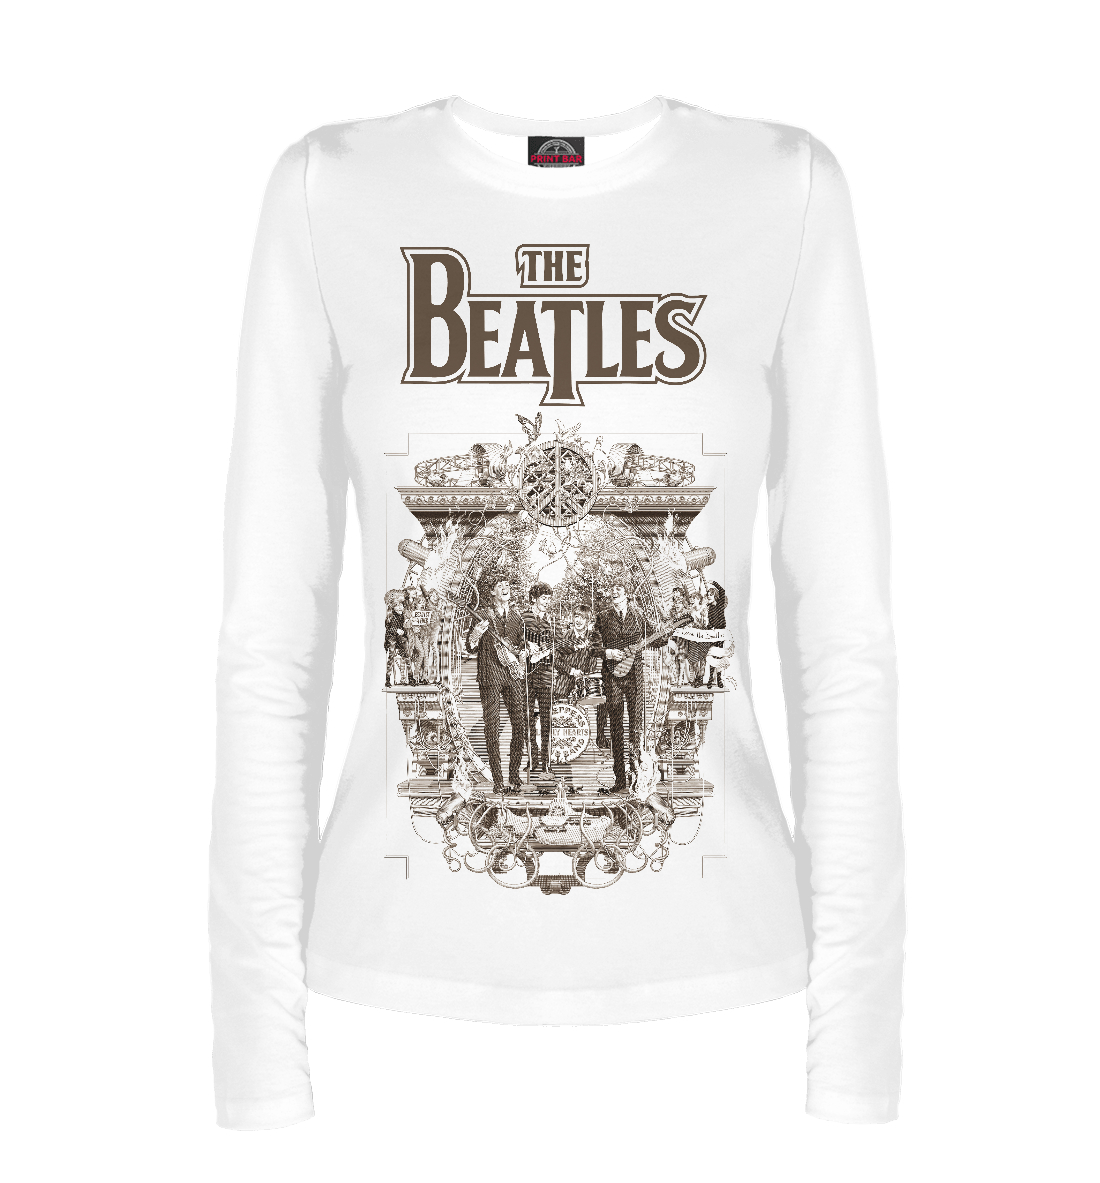 The Beatles the beatles the beatles live at the bbc 2 cd